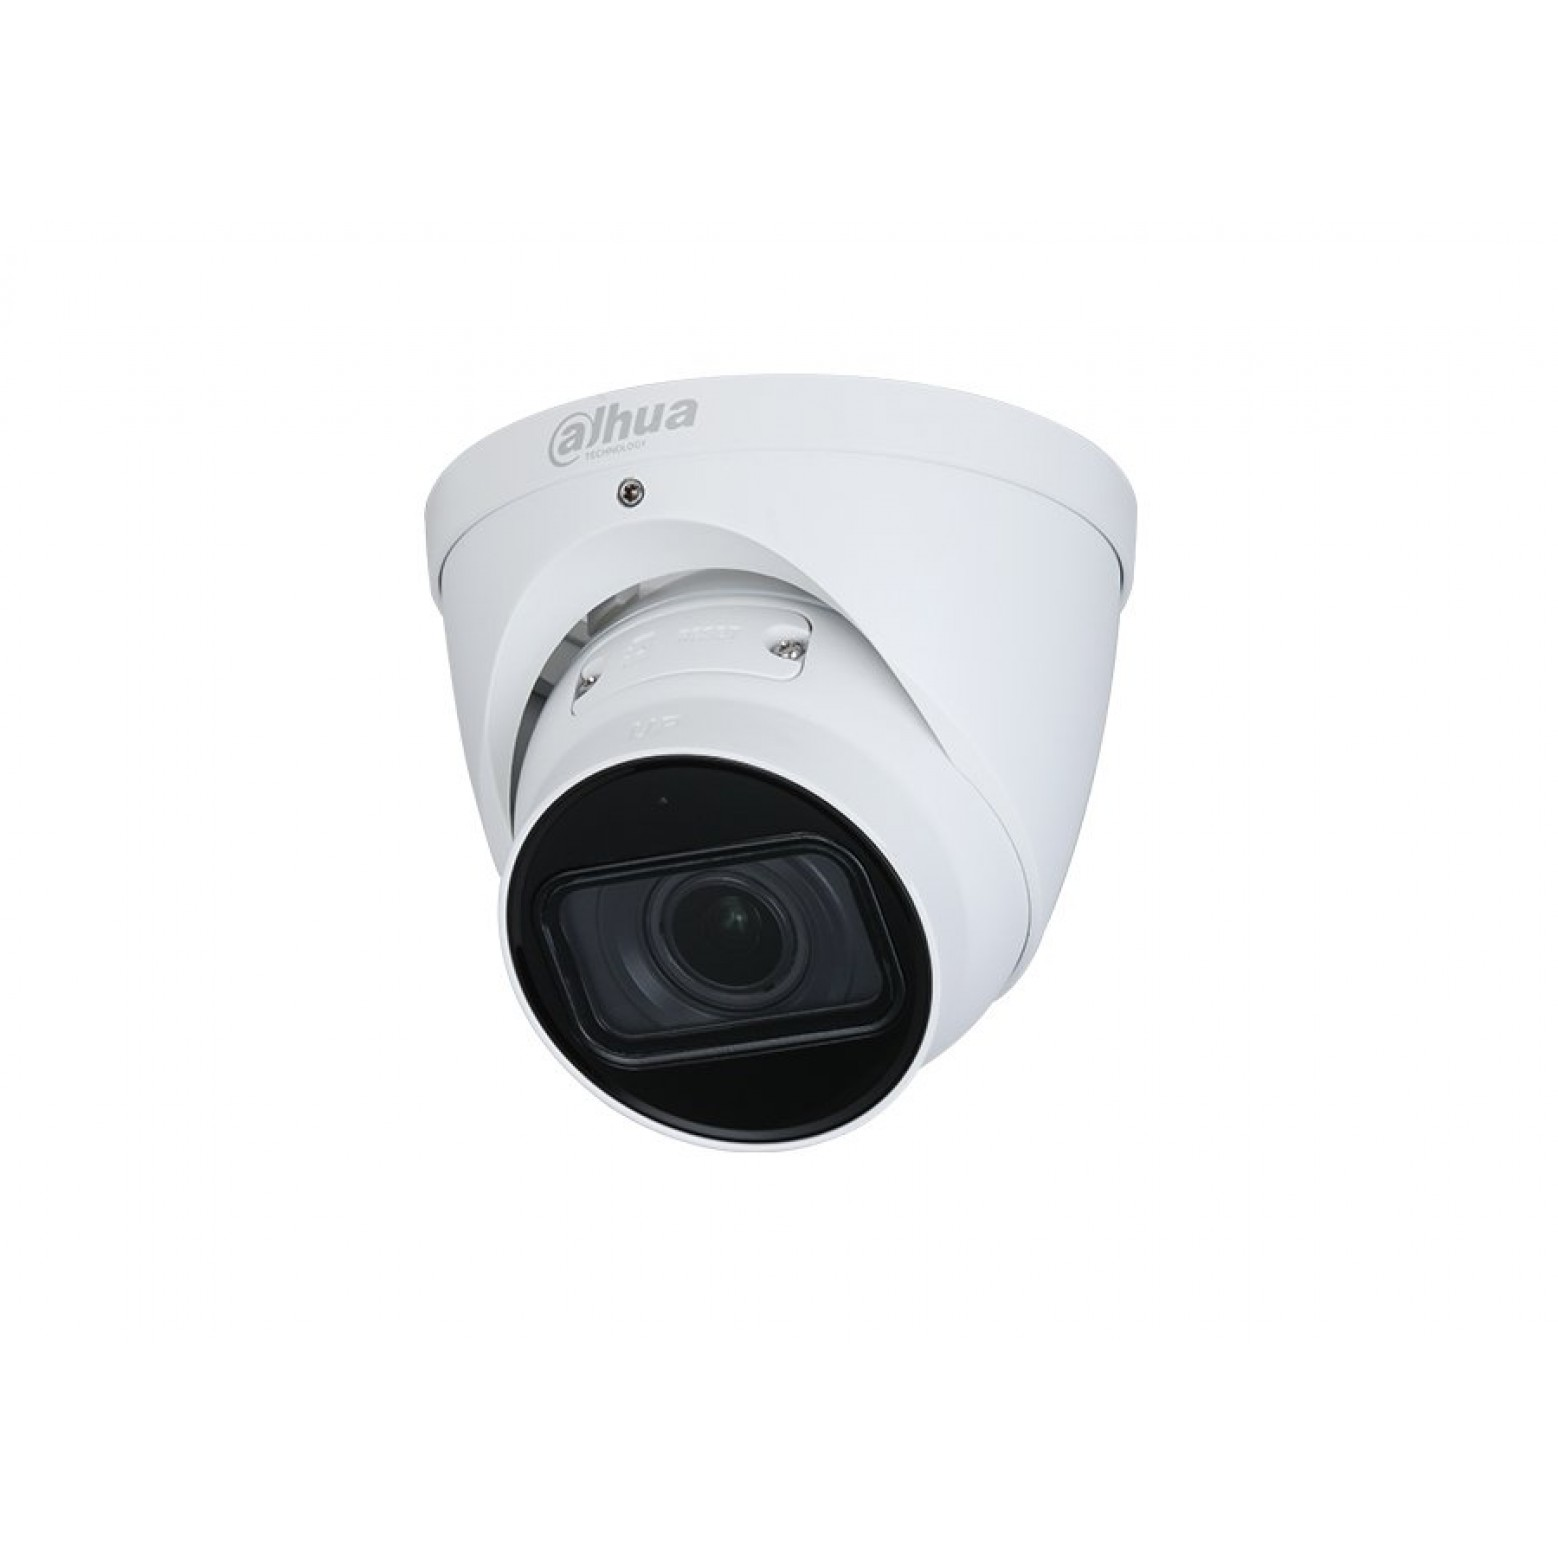 Dahua IPC-HDW3441T-ZAS 4MP Lite AI IR Vari-focal Eyeball Network Camera